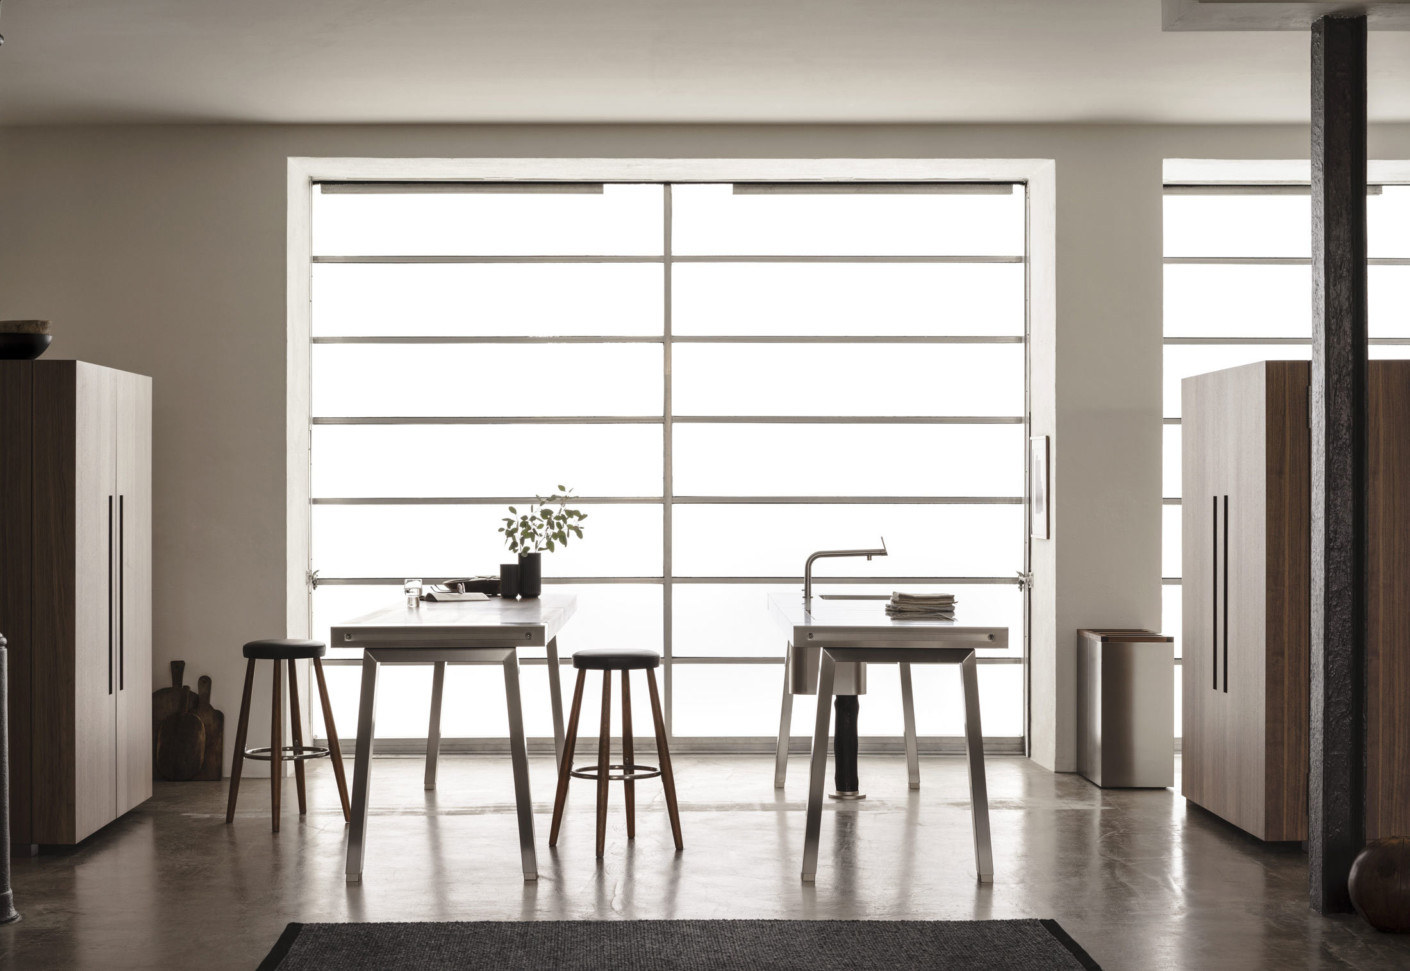 bulthaup b2 von bulthaup stylepark. Black Bedroom Furniture Sets. Home Design Ideas